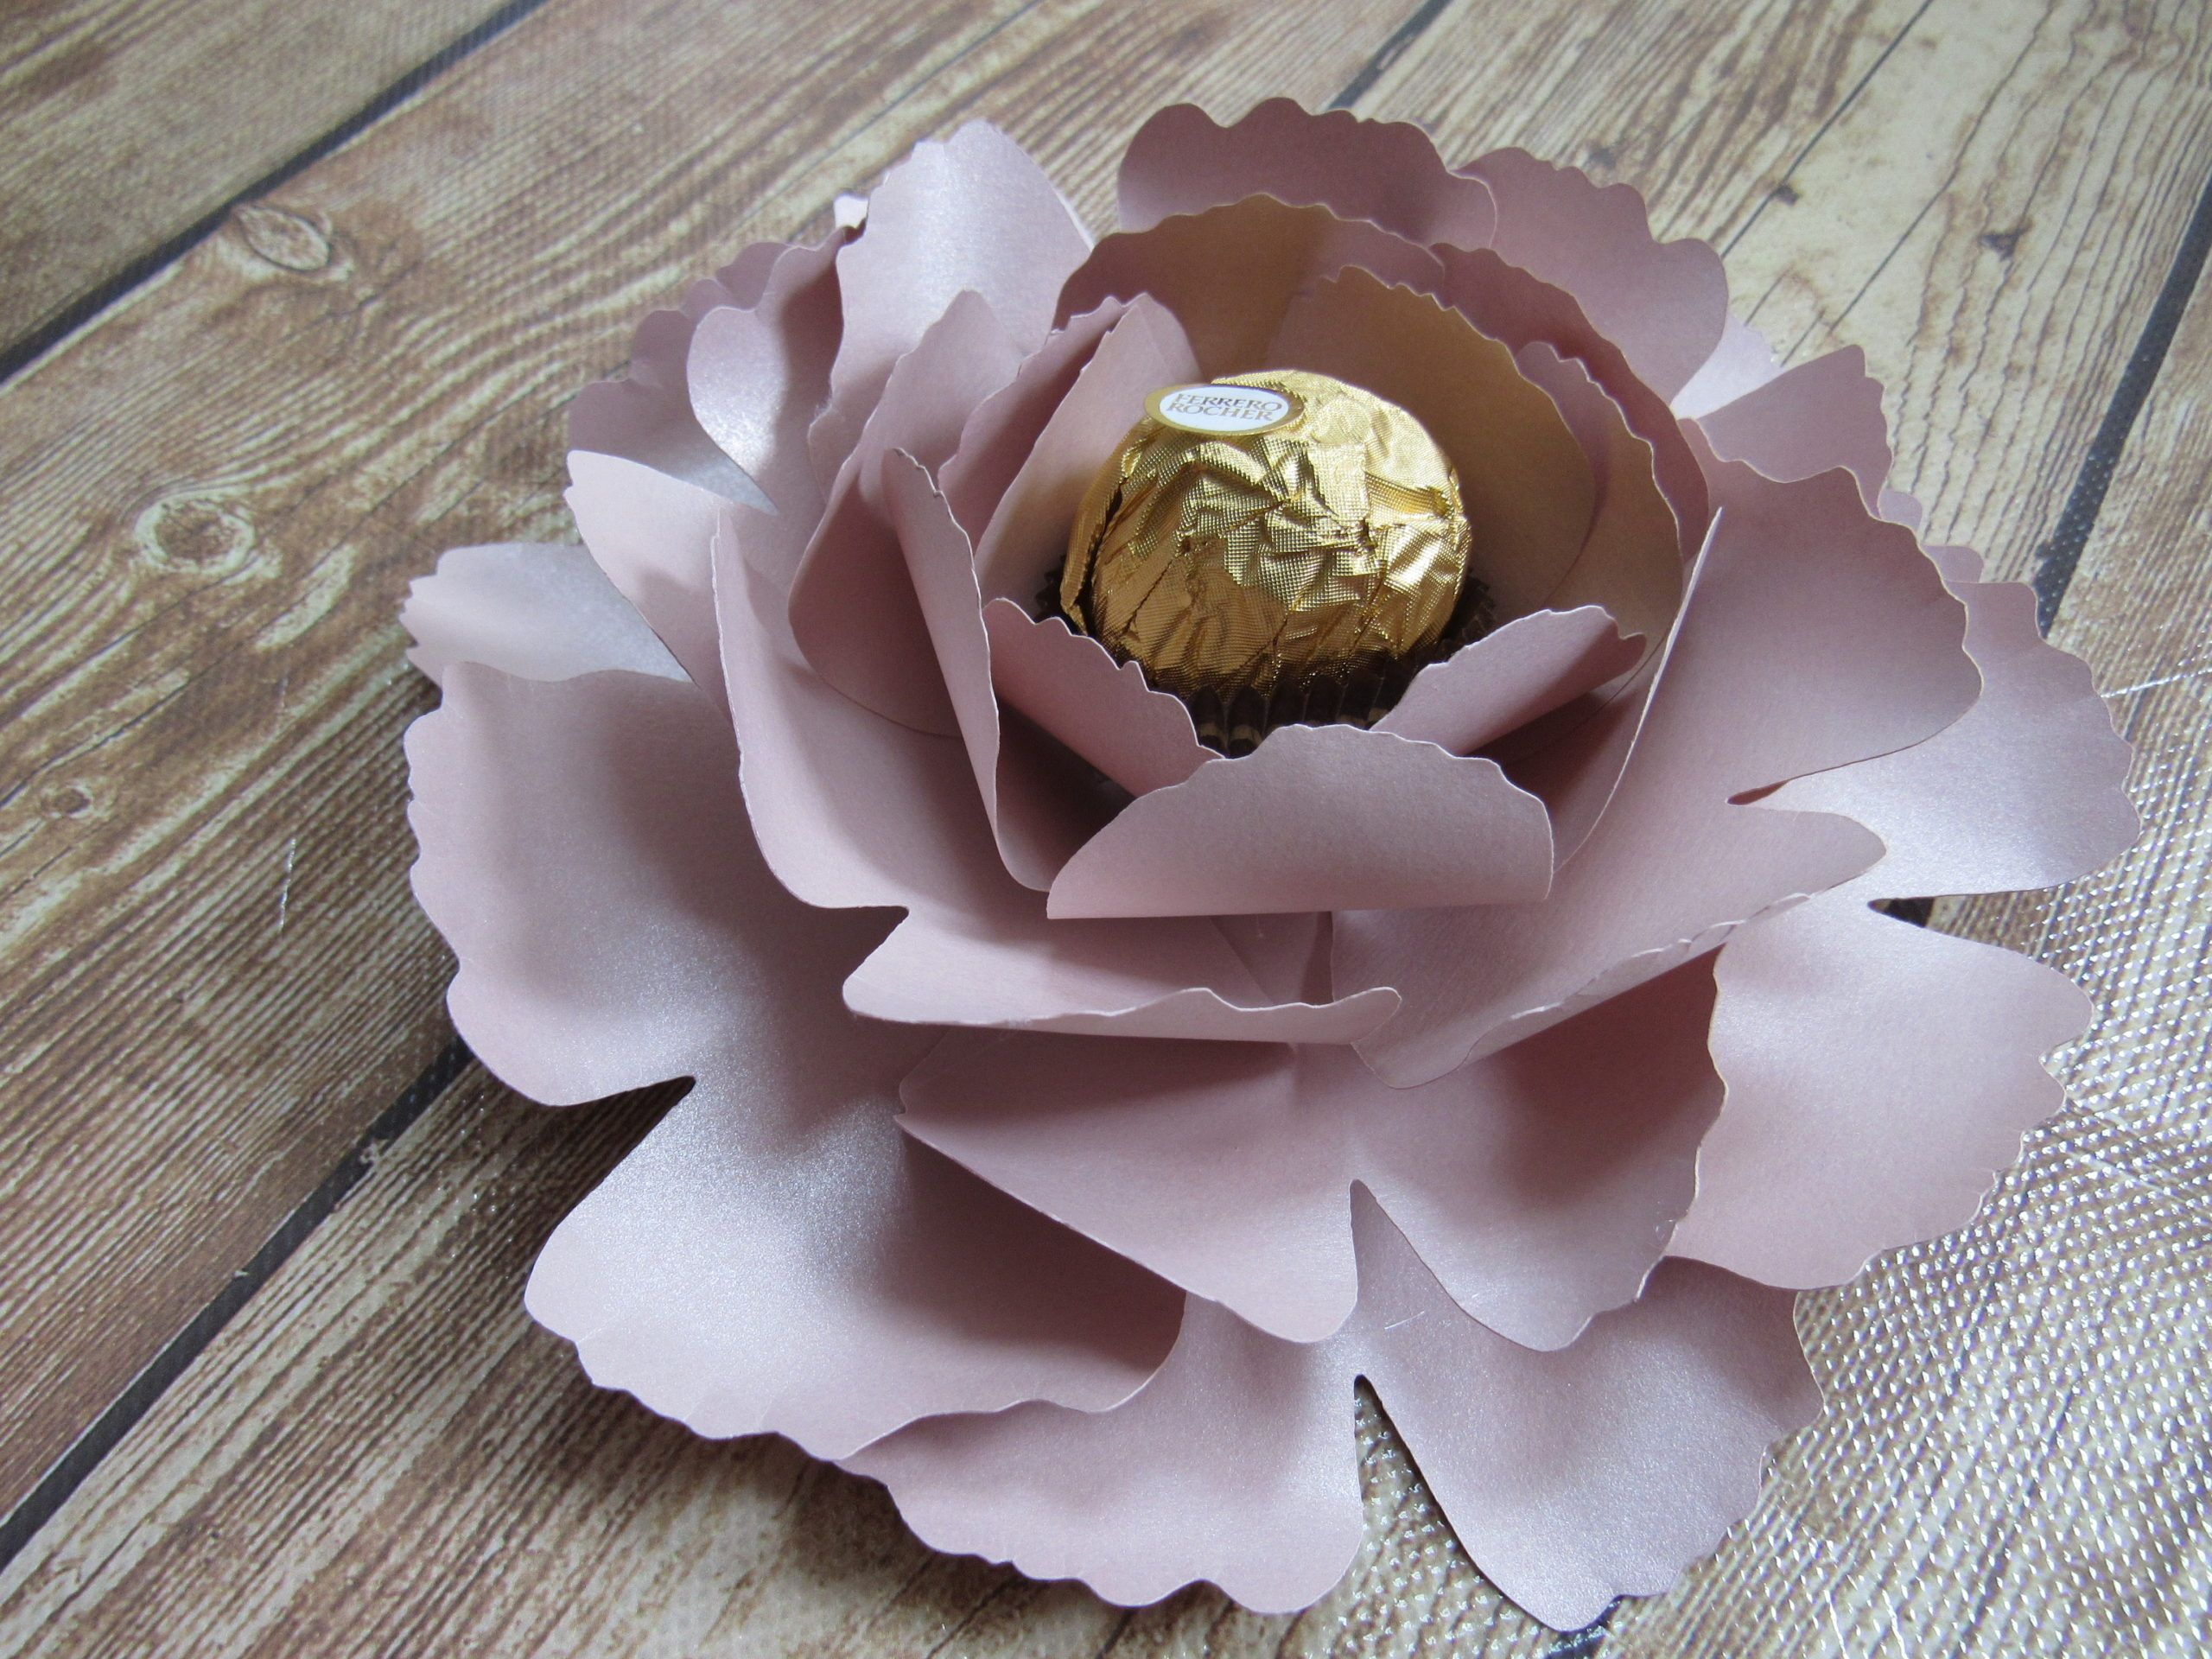 Paper Flower Peony Rose Gold Full Tutorial Paperpapers In 2020 Paper Flowers Paper Flower Centerpieces Peony Rose